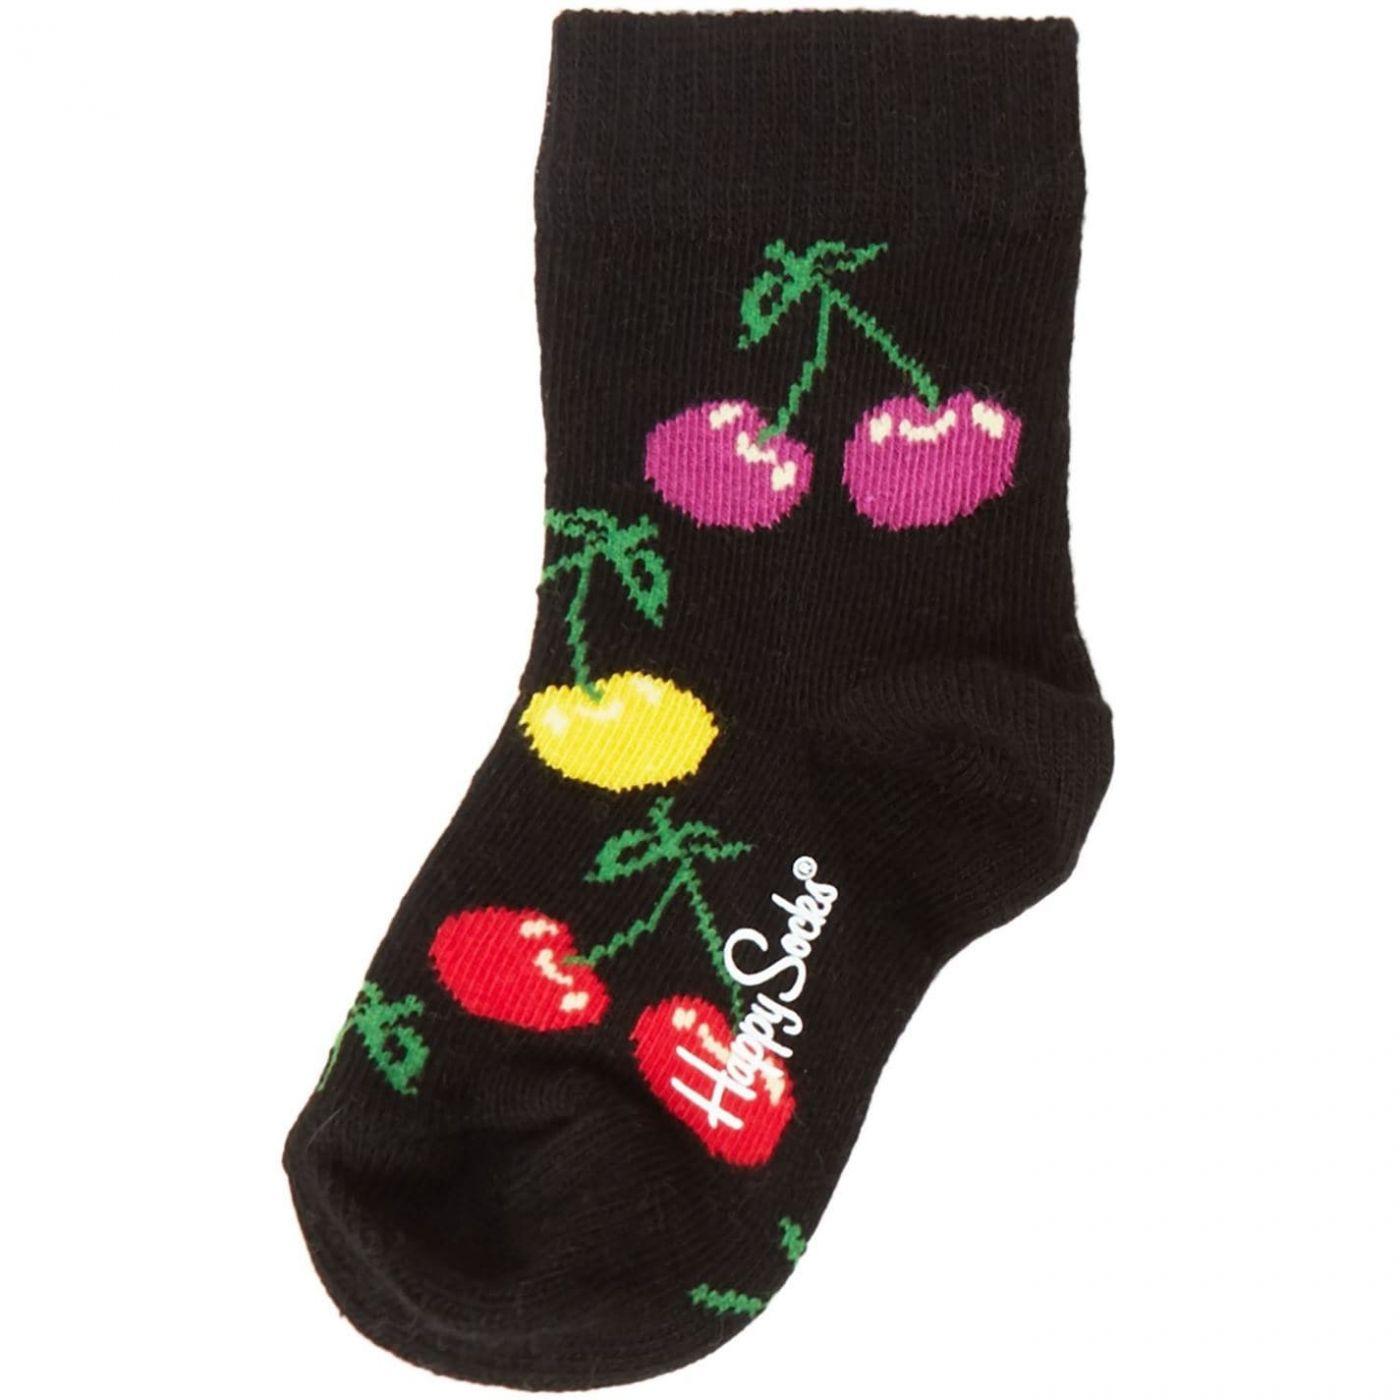 Happy Socks Cherry Print Socks